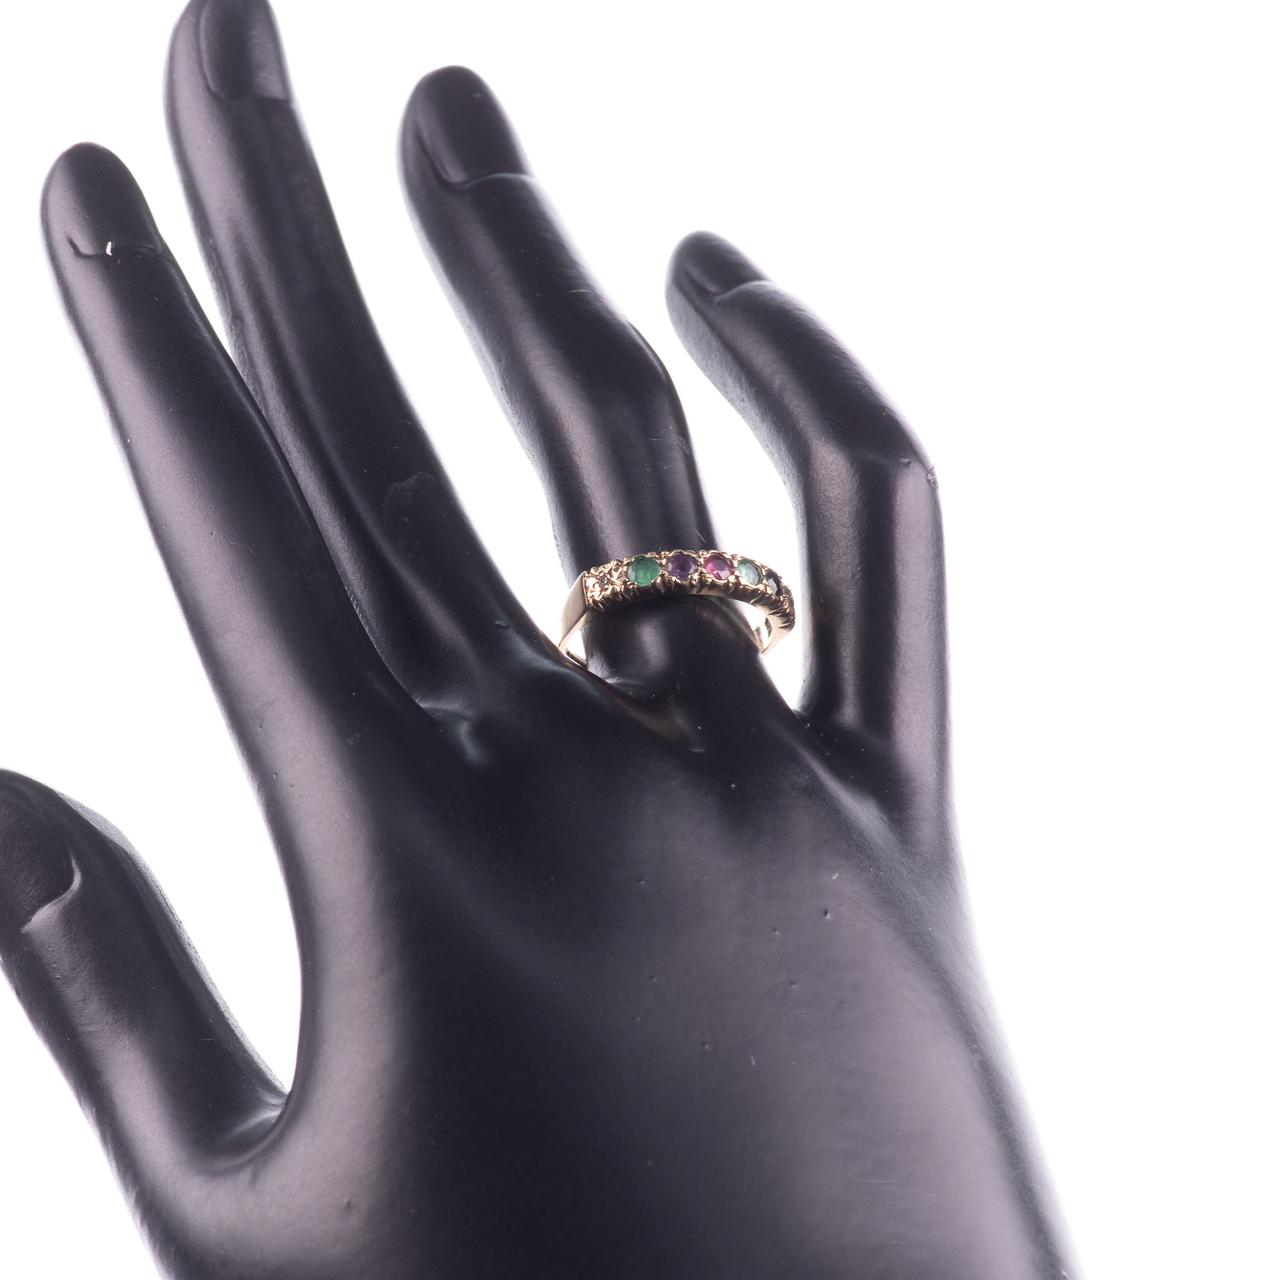 9ct Gold Emerald, Ruby, Amethyst, Sapphire & Diamond Ring - Image 2 of 8